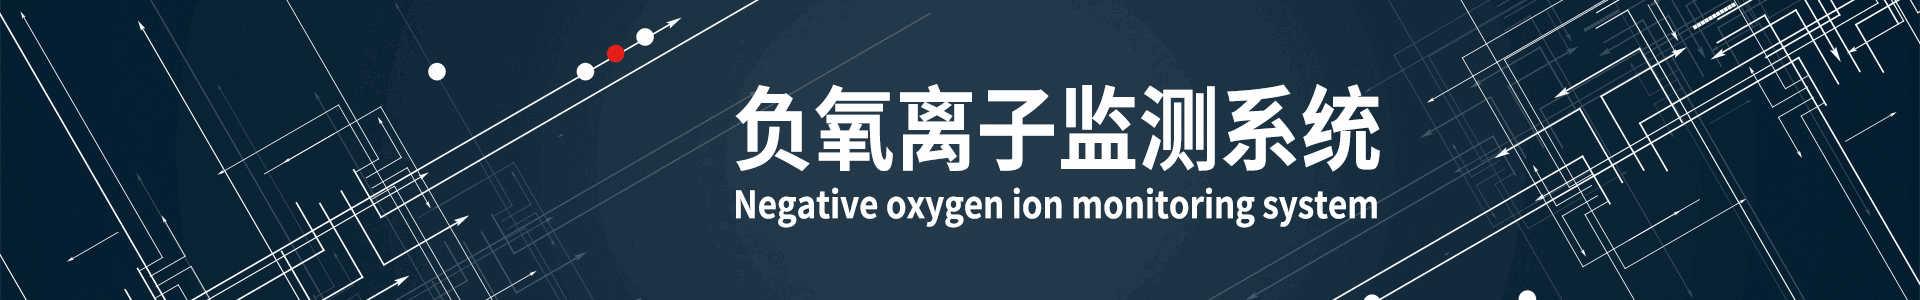 负氧离子监测系统banner